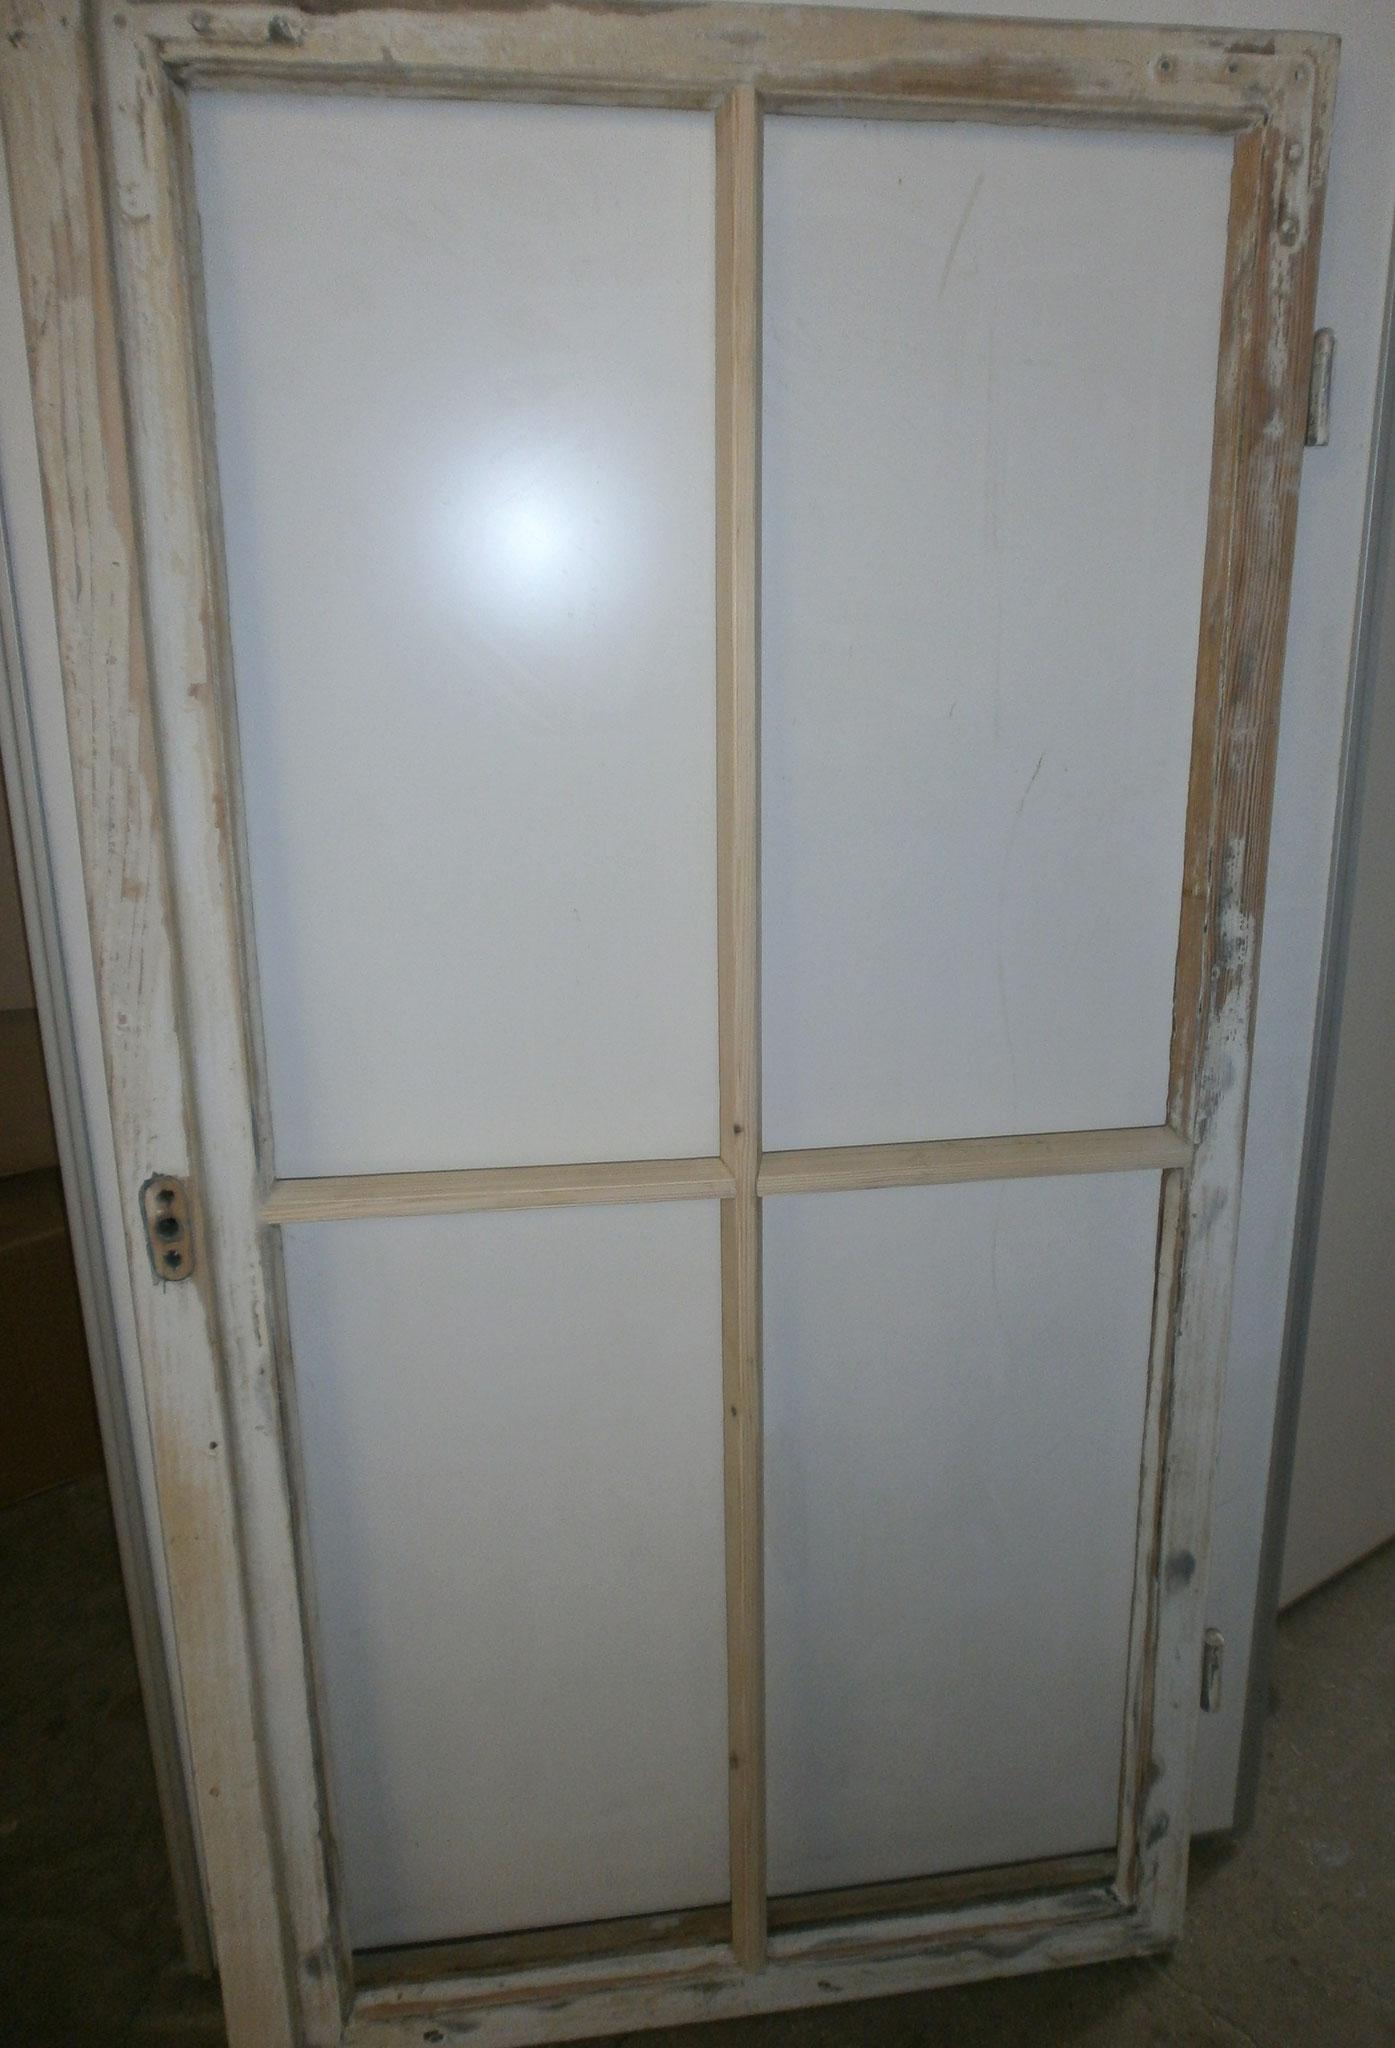 Restaurierung denkmalgeschützter Fenster - Kreuzüberplattung nach Brandschaden